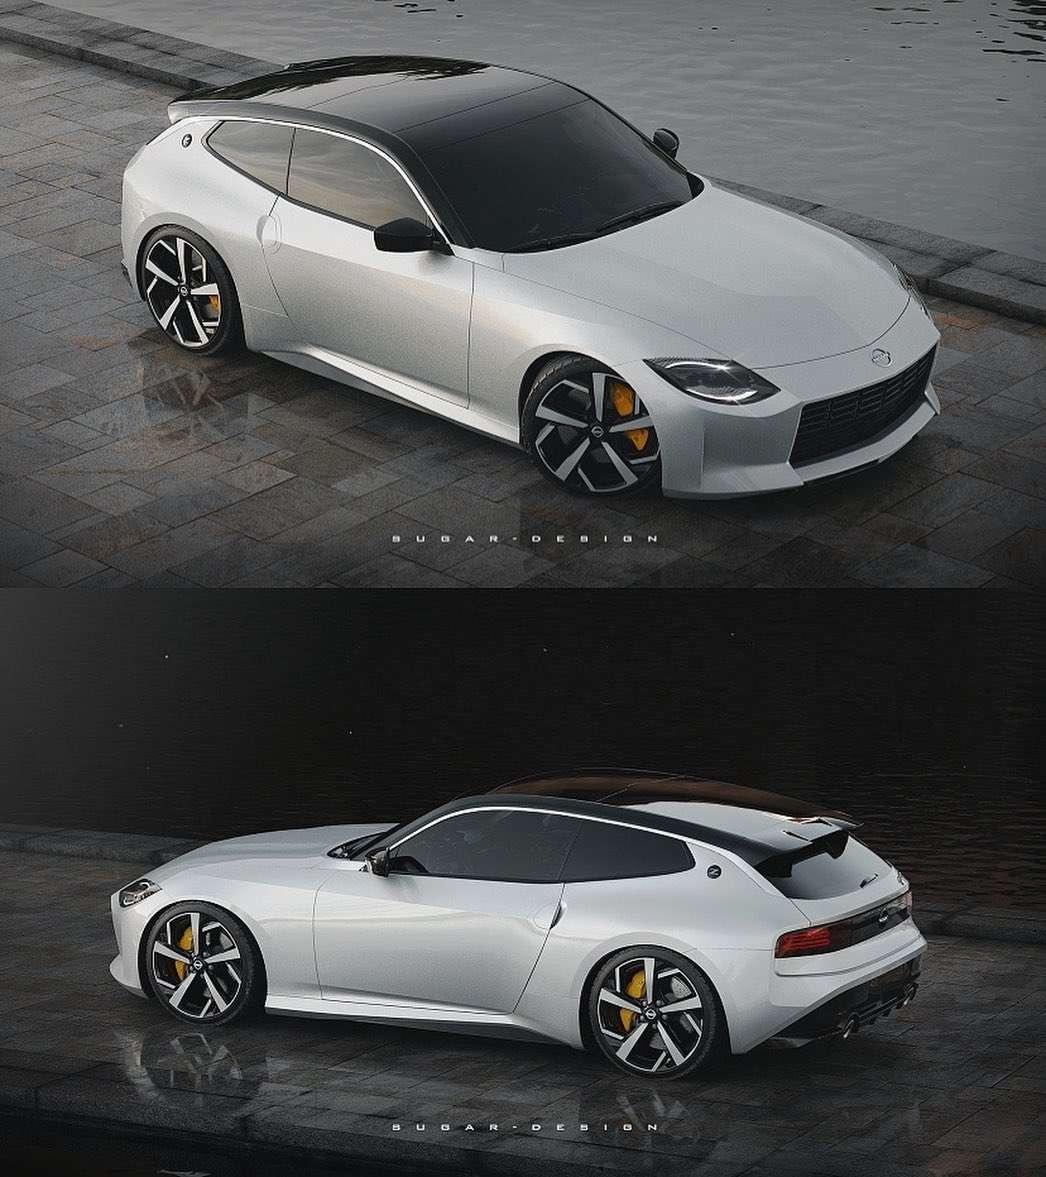 nissan-fairlady-400z-hatchback-rendering-looks-like-an-improved-z-car_1.jpg